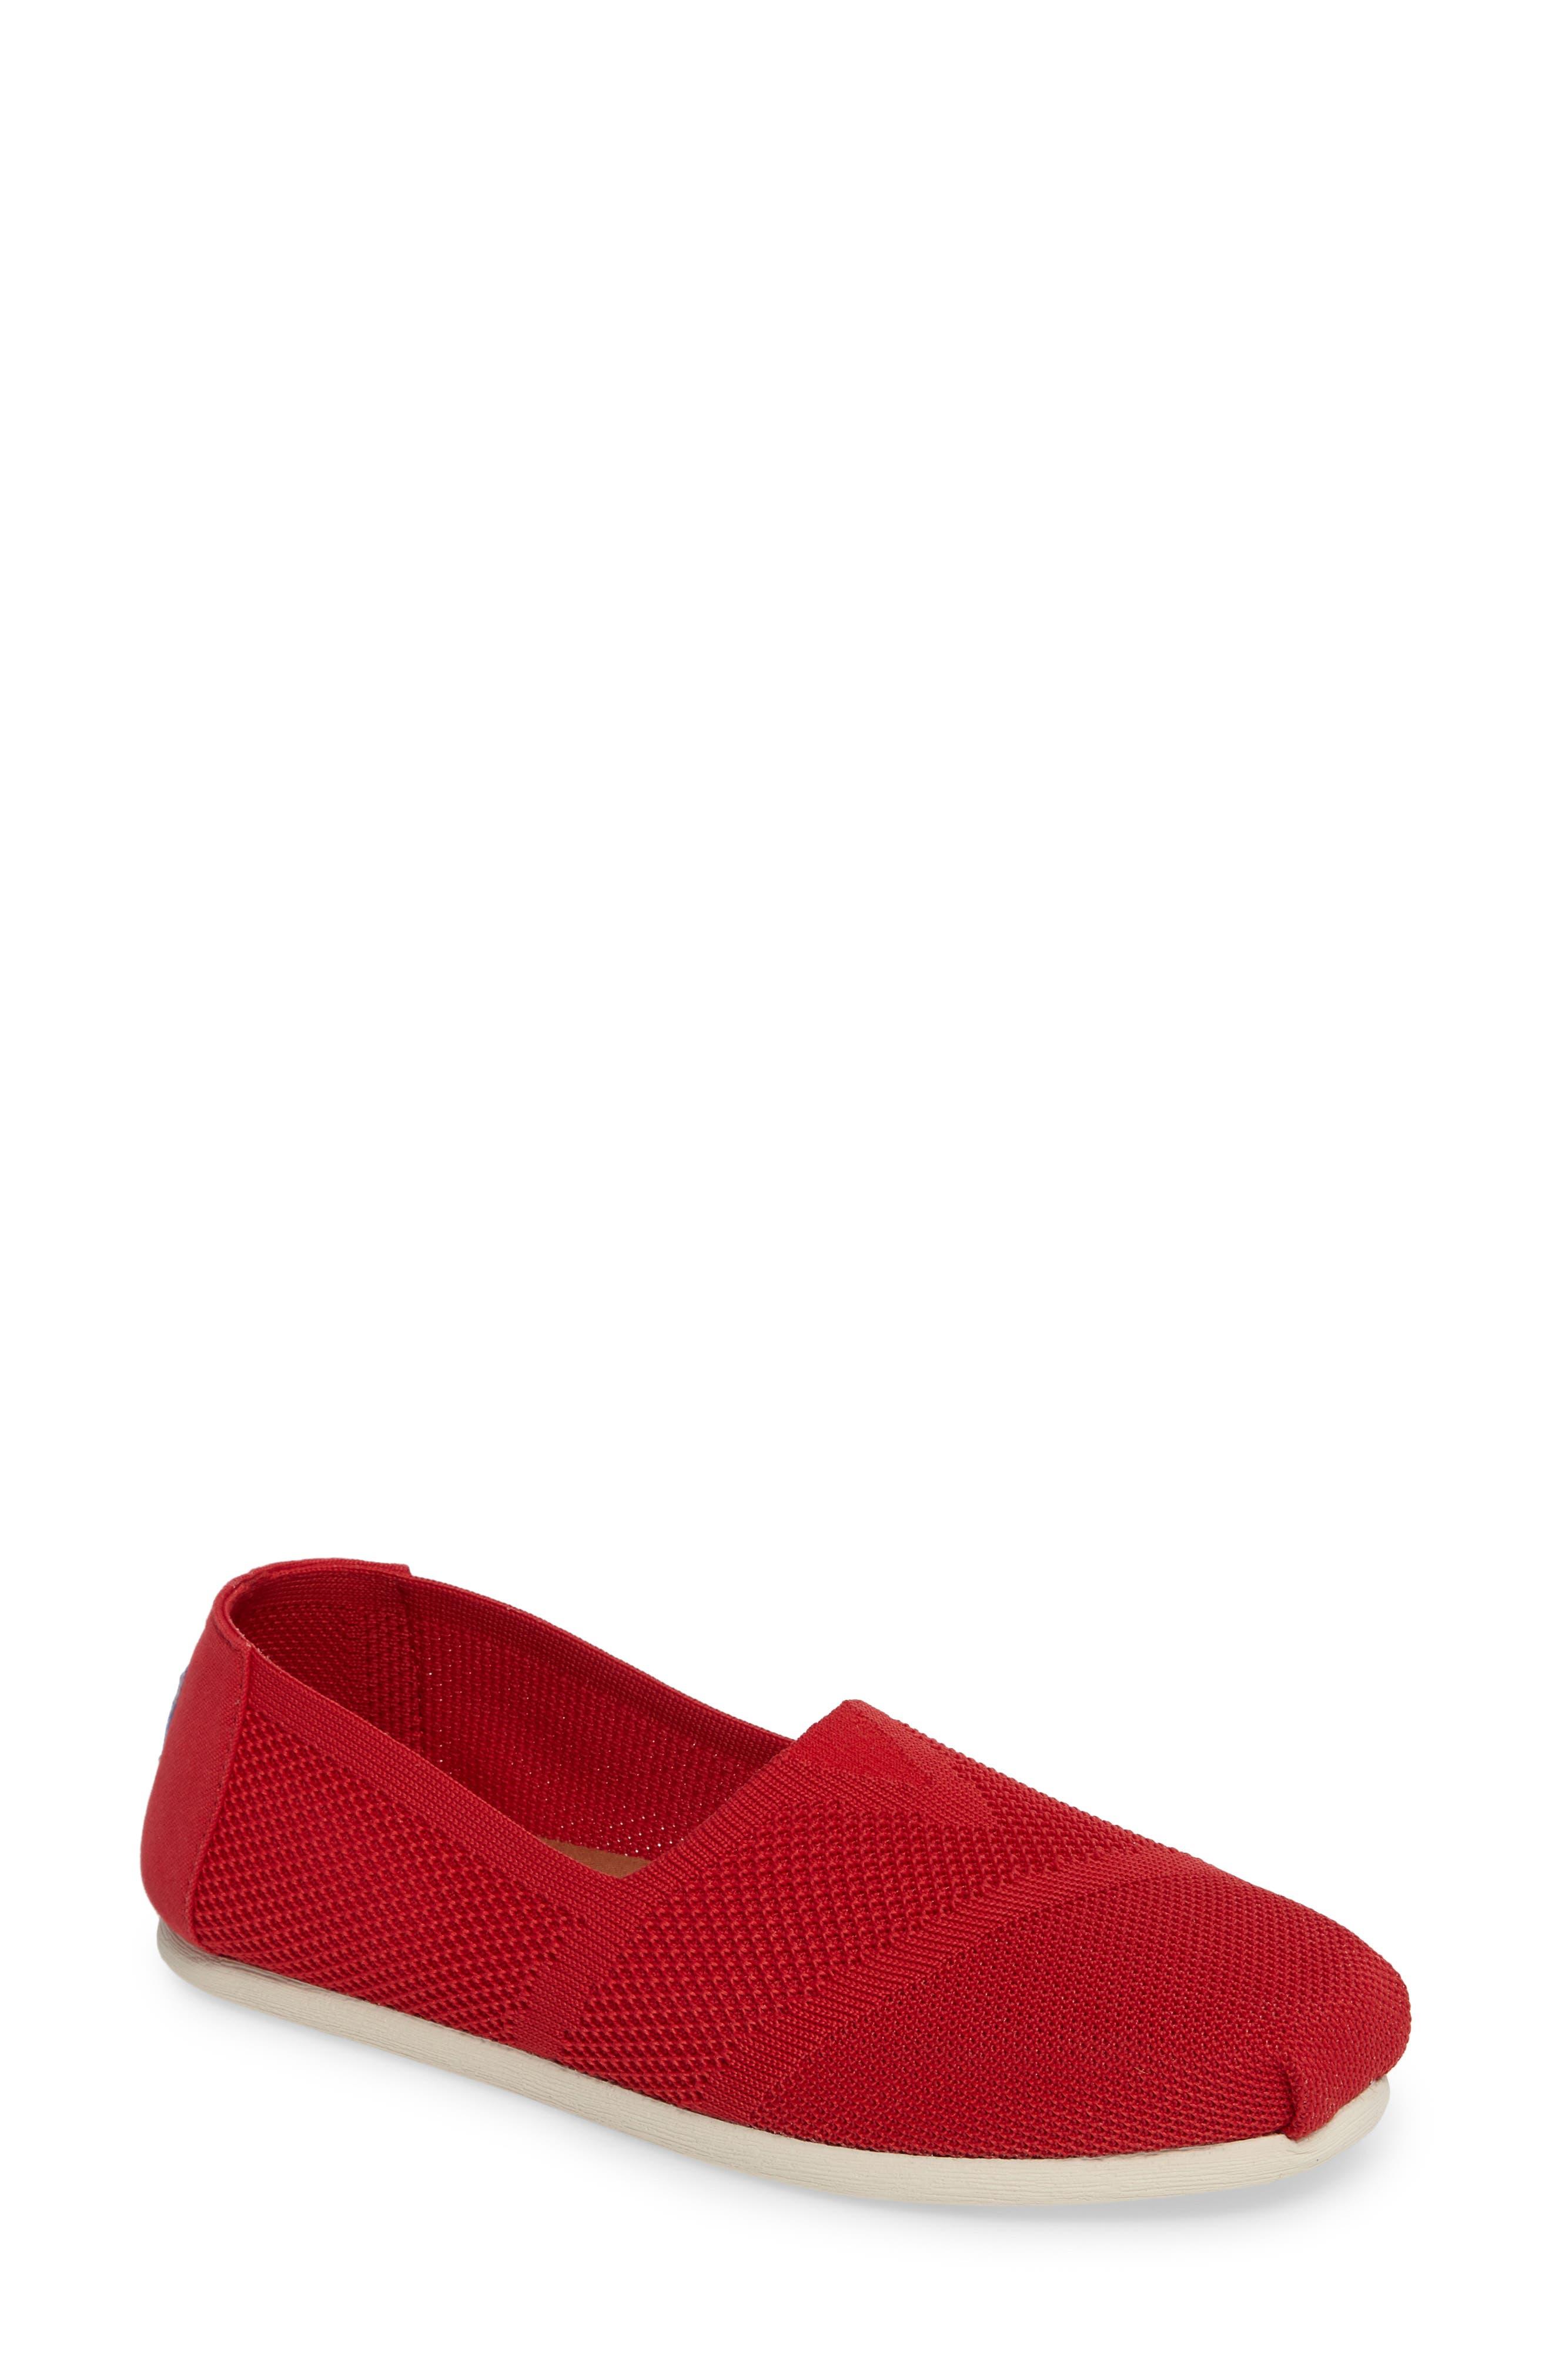 TOMS Alpargata Knit Slip-On (Women)